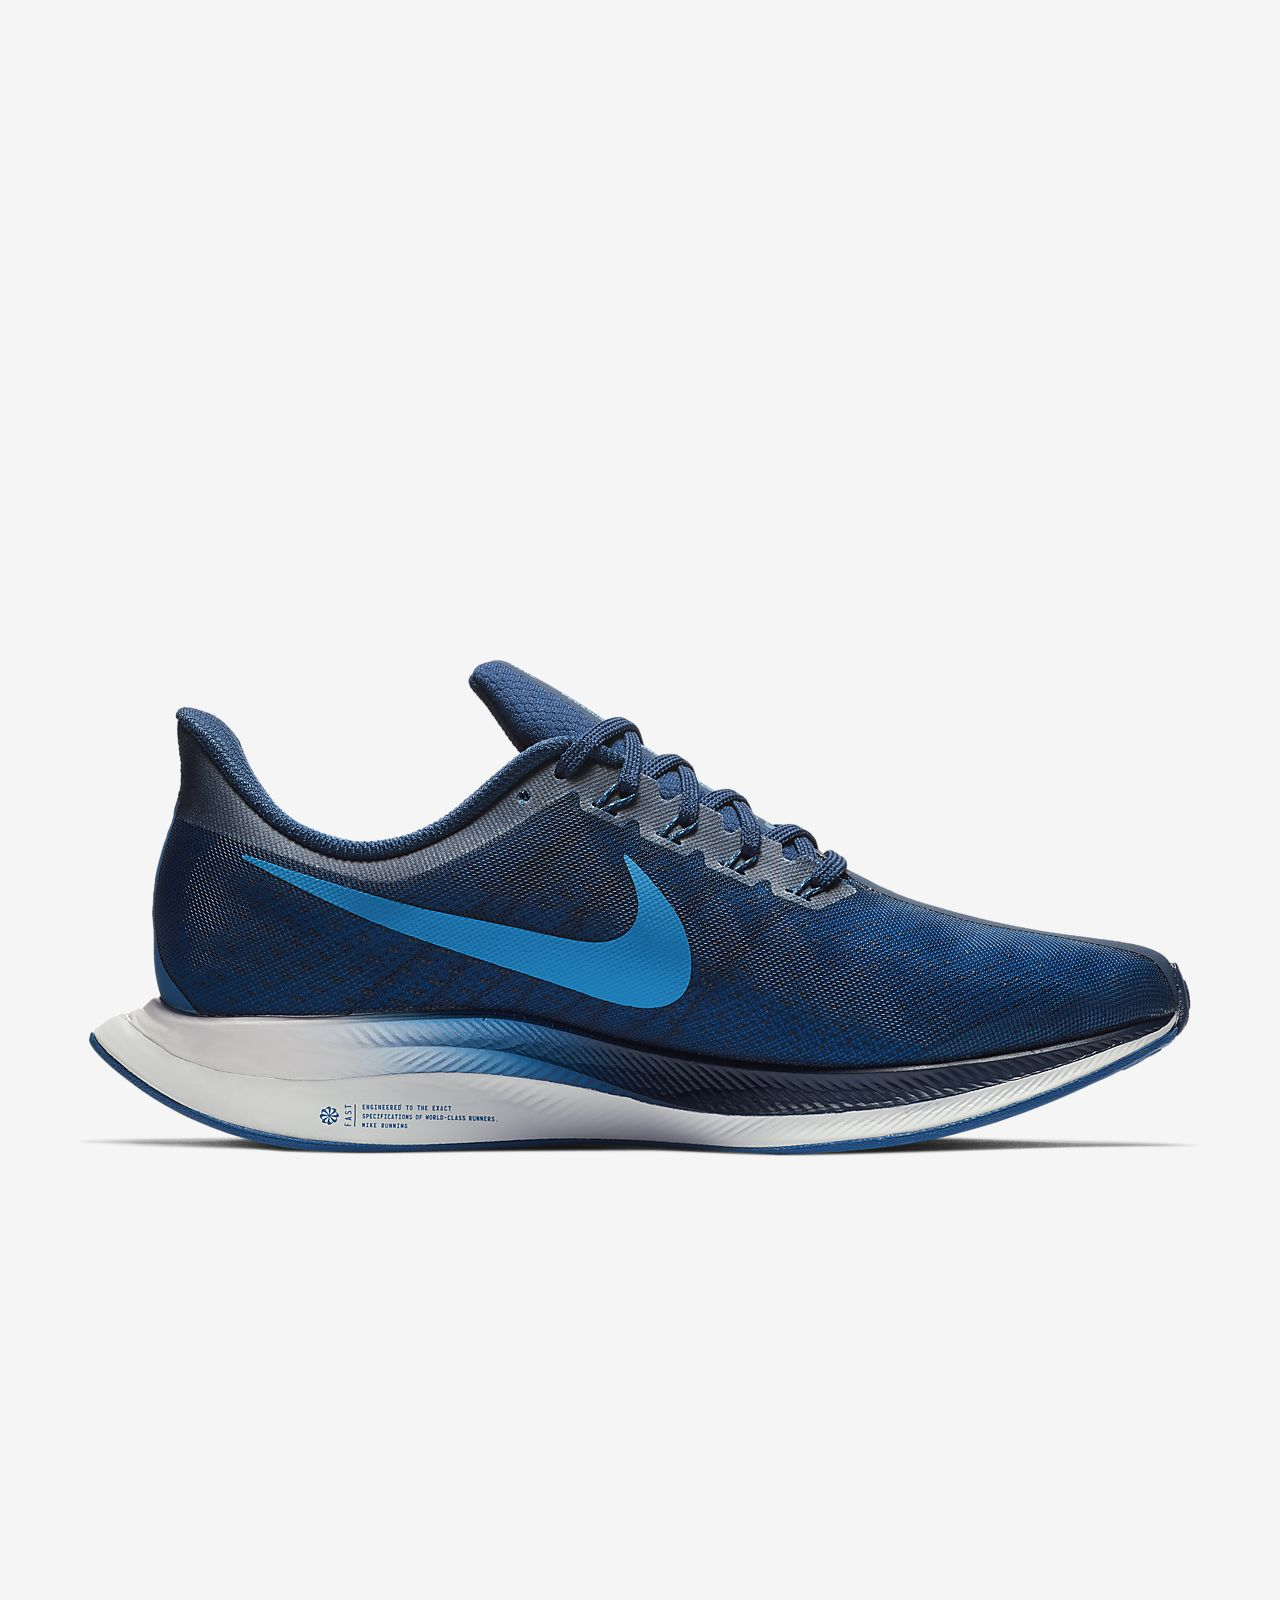 6fc56bd271aa Nike Zoom Pegasus Turbo Men s Running Shoe. Nike.com